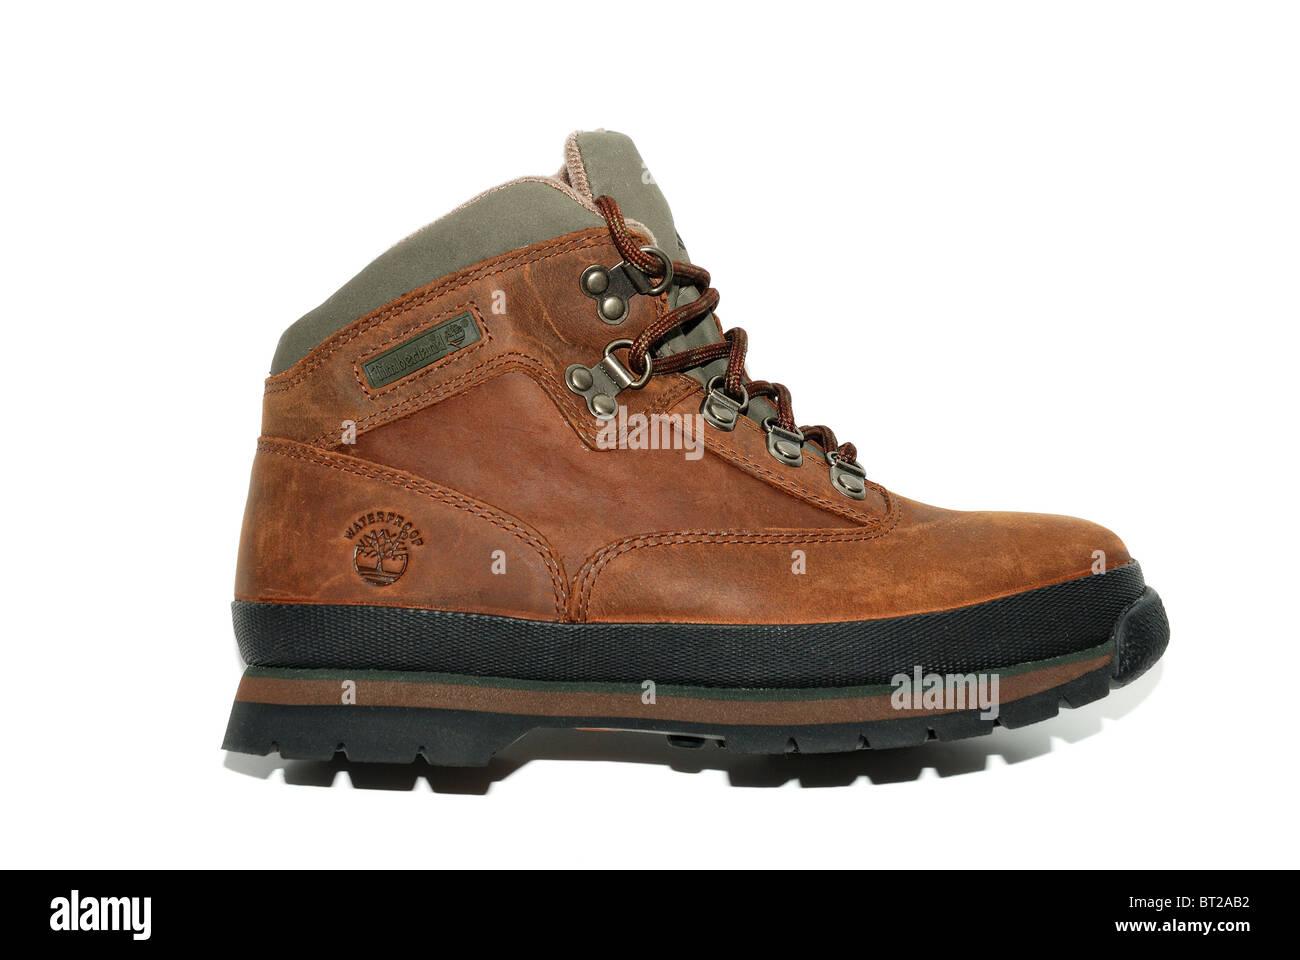 8d57aaf8957 timberland boys nubuck leather walking boots Stock Photo: 32014166 ...